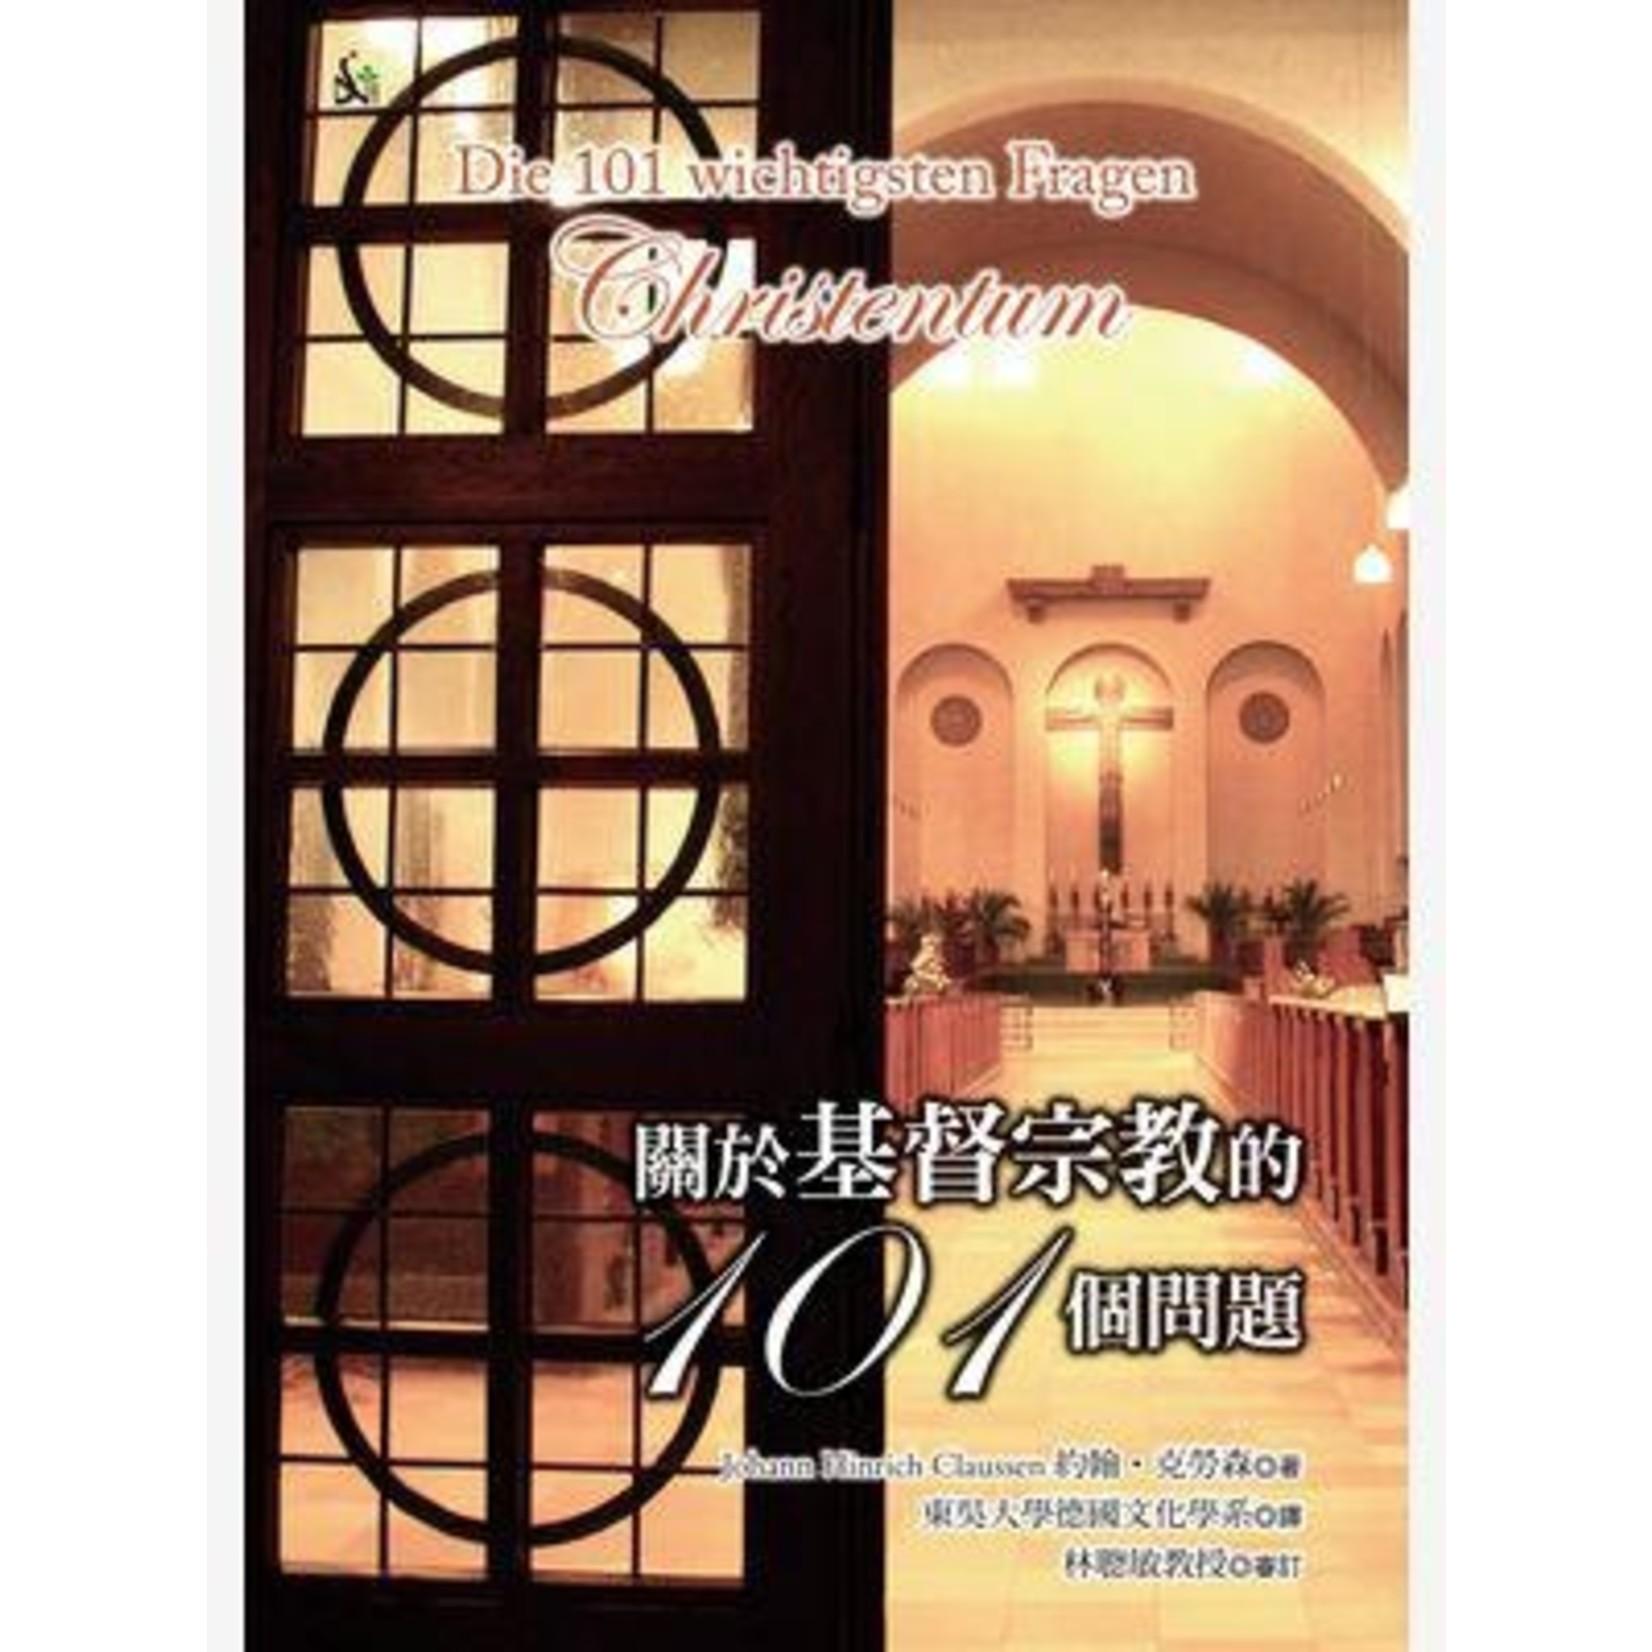 南與北文化 South & North Publishing 關於基督宗教的101個問題 Die 101 wichtigsten Fragen: Christentum